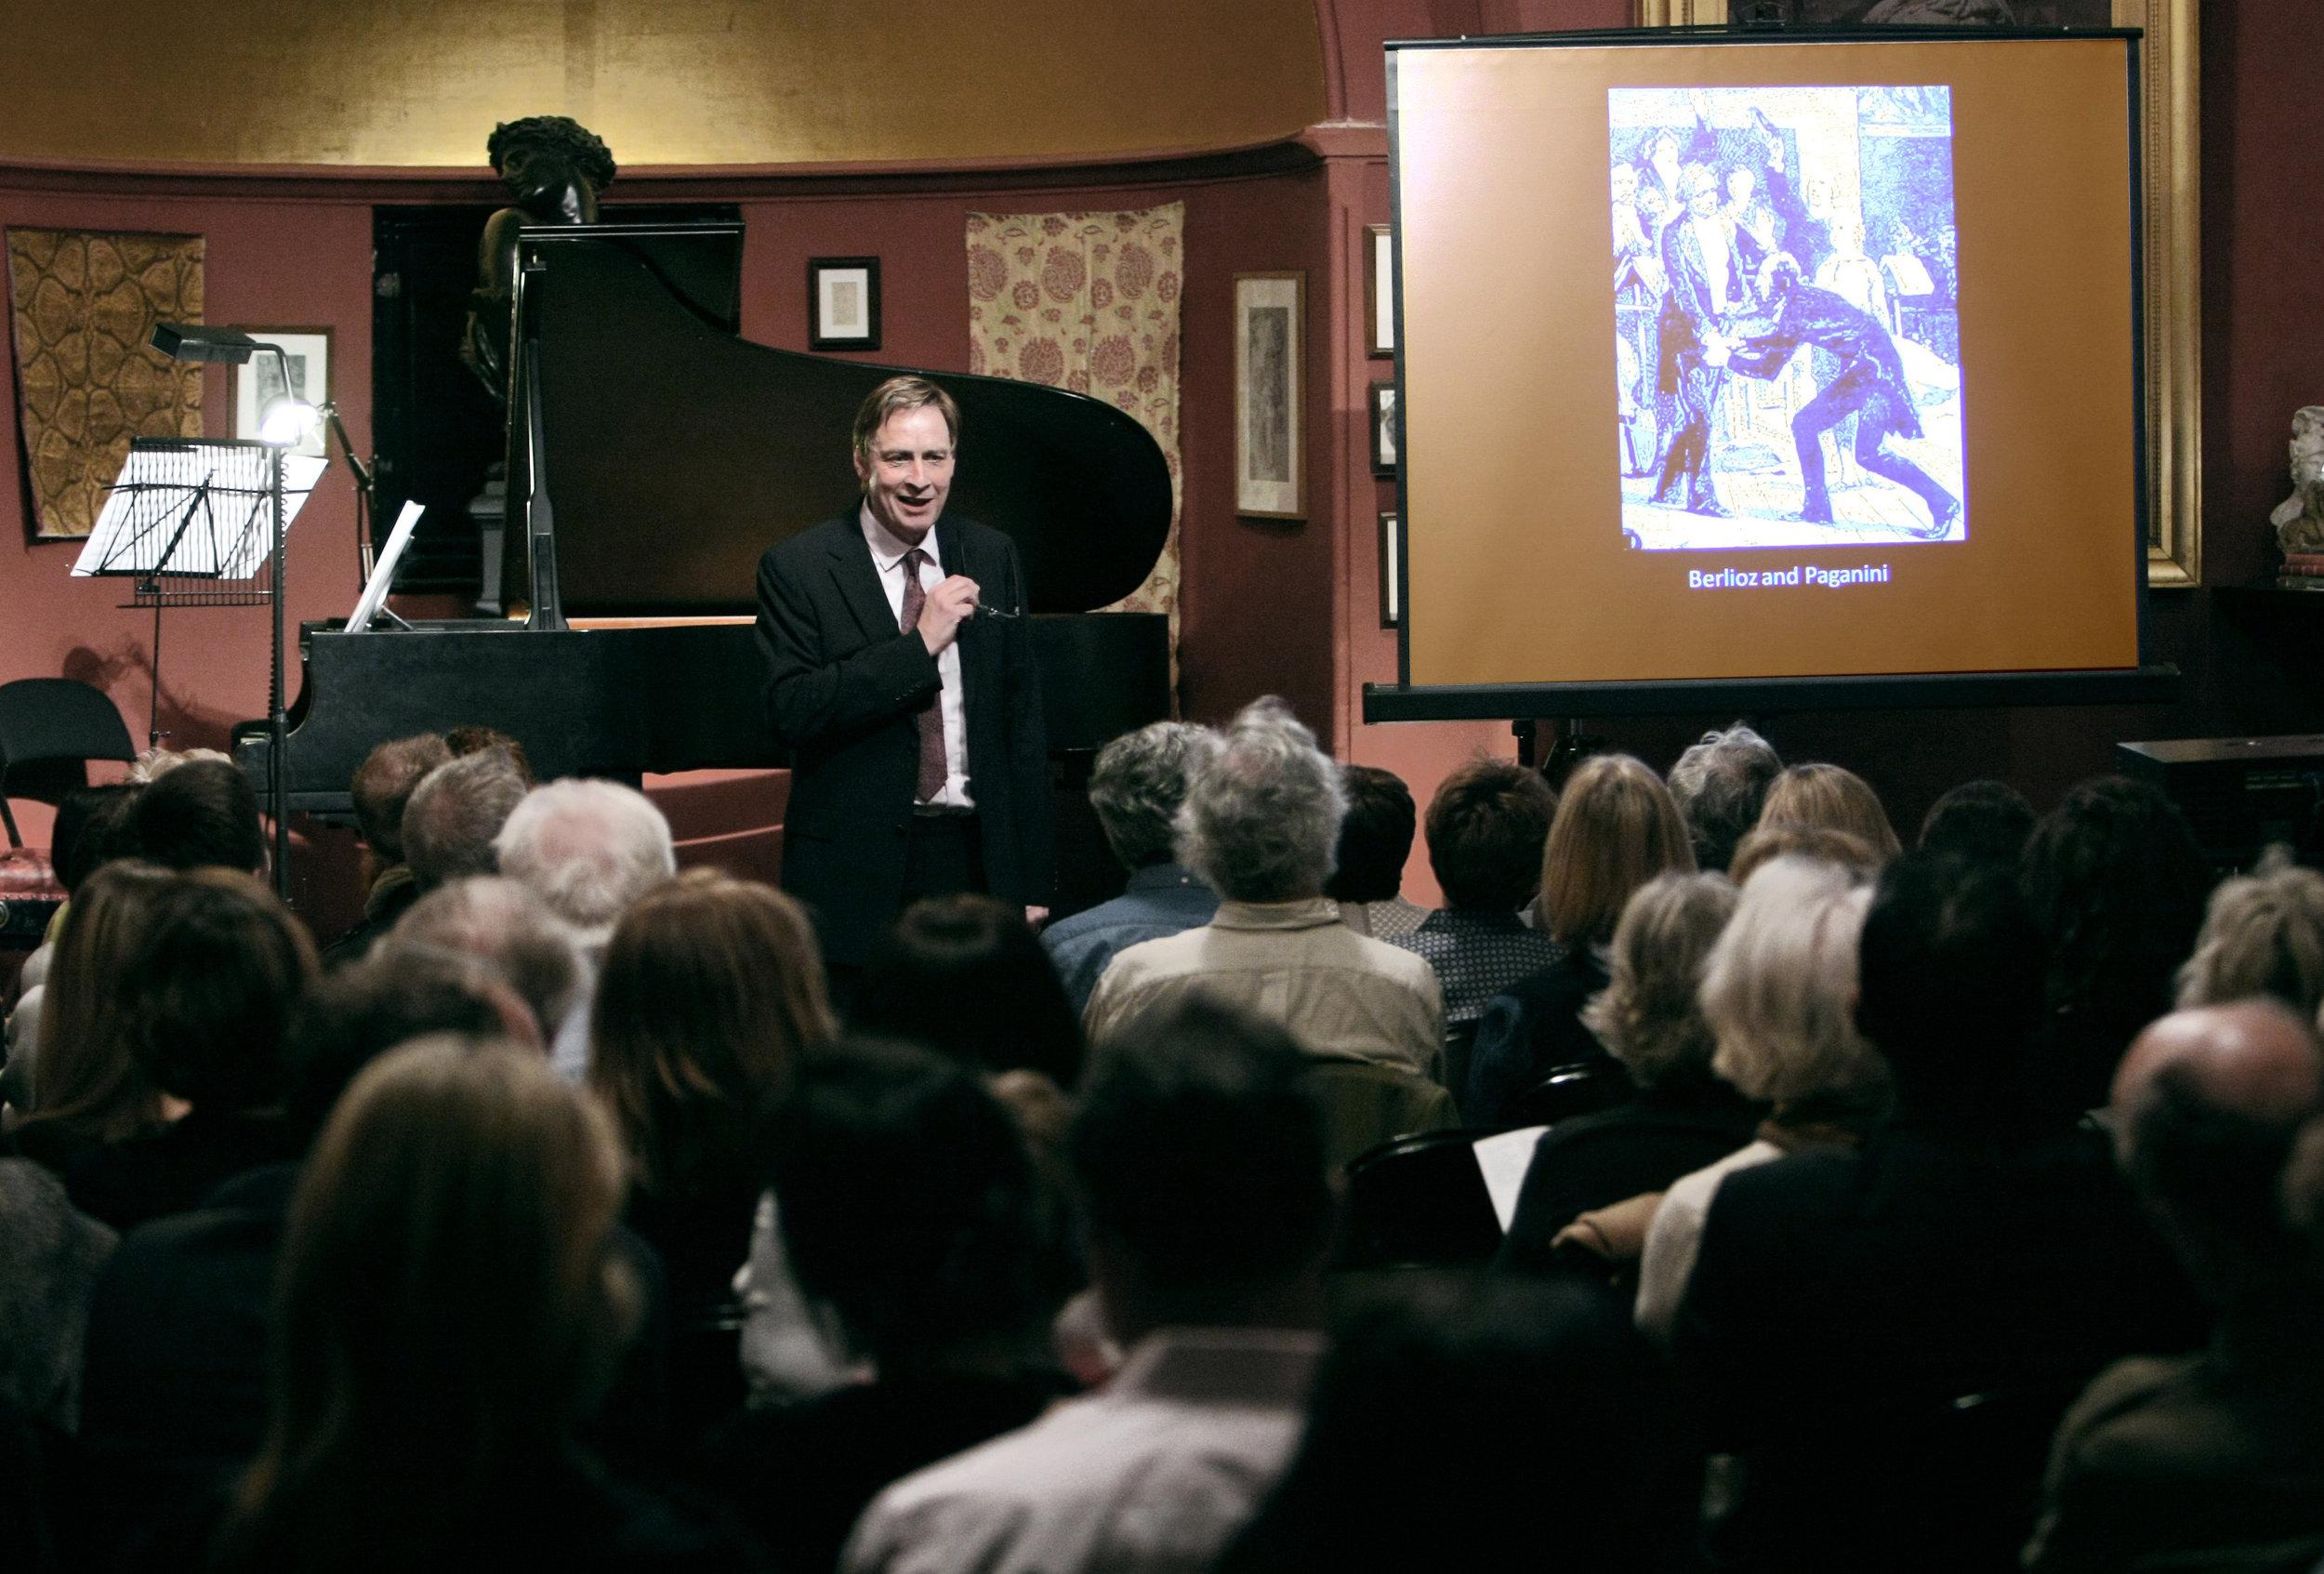 WANDERERS: BYRON, LISZT AND BERLIOZ - april 25, 2015. londonIakov Zats, violaVsevolod Dvorkin, pianoIllustrated talk by Stephen JohnsonLiszt - Années de pèlerinage. Première année: SuisseBerlioz, arr. Liszt - Harold en Italie